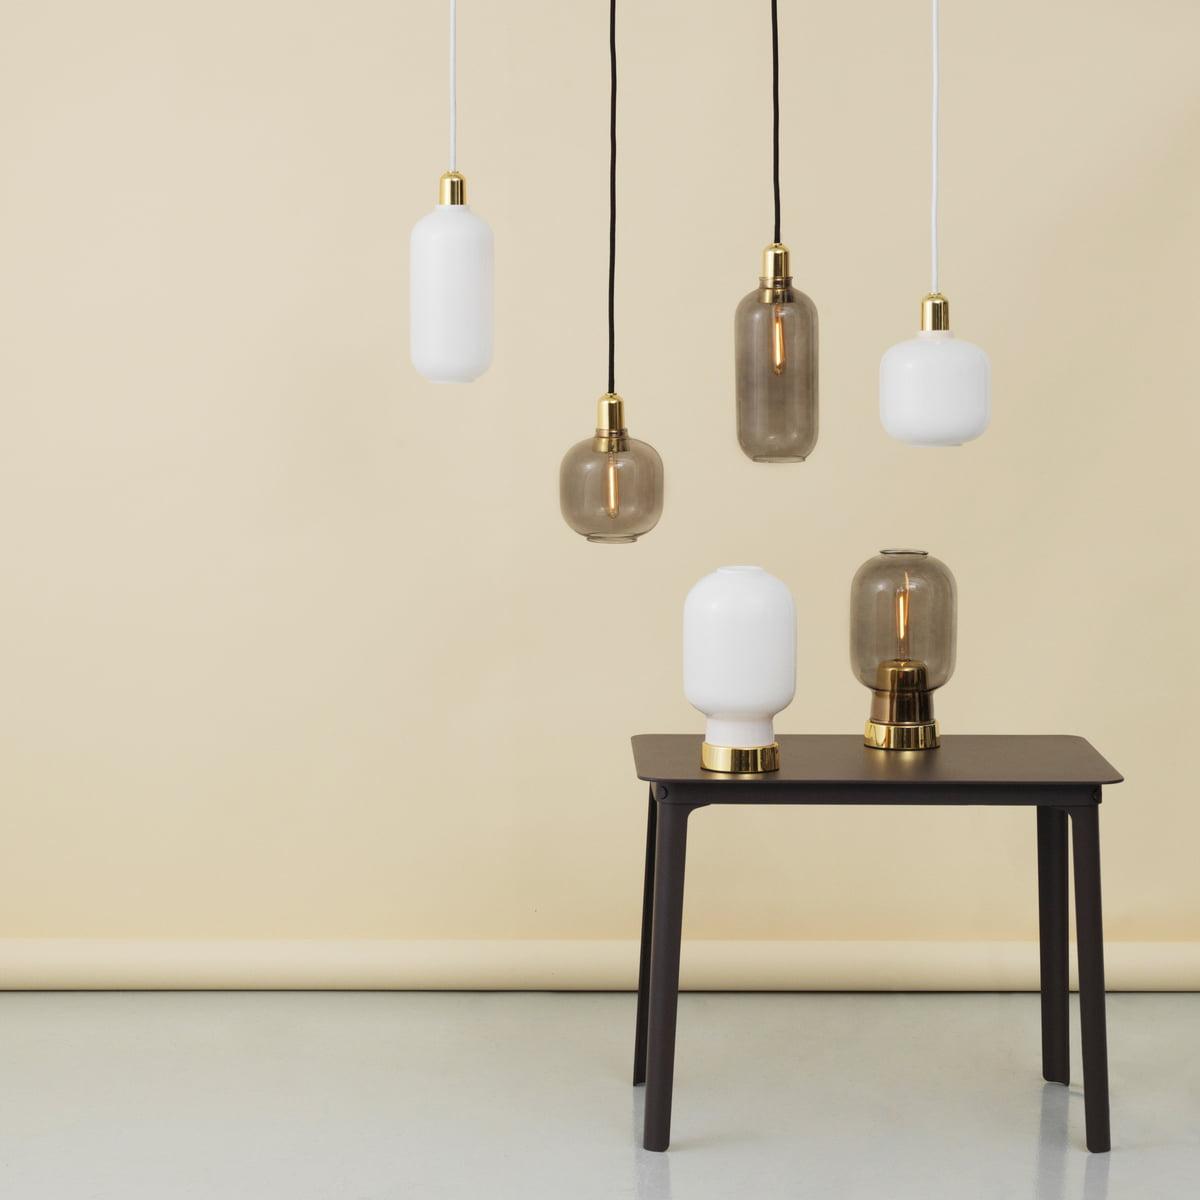 amp pendant lamp by normann copenhagen. Black Bedroom Furniture Sets. Home Design Ideas